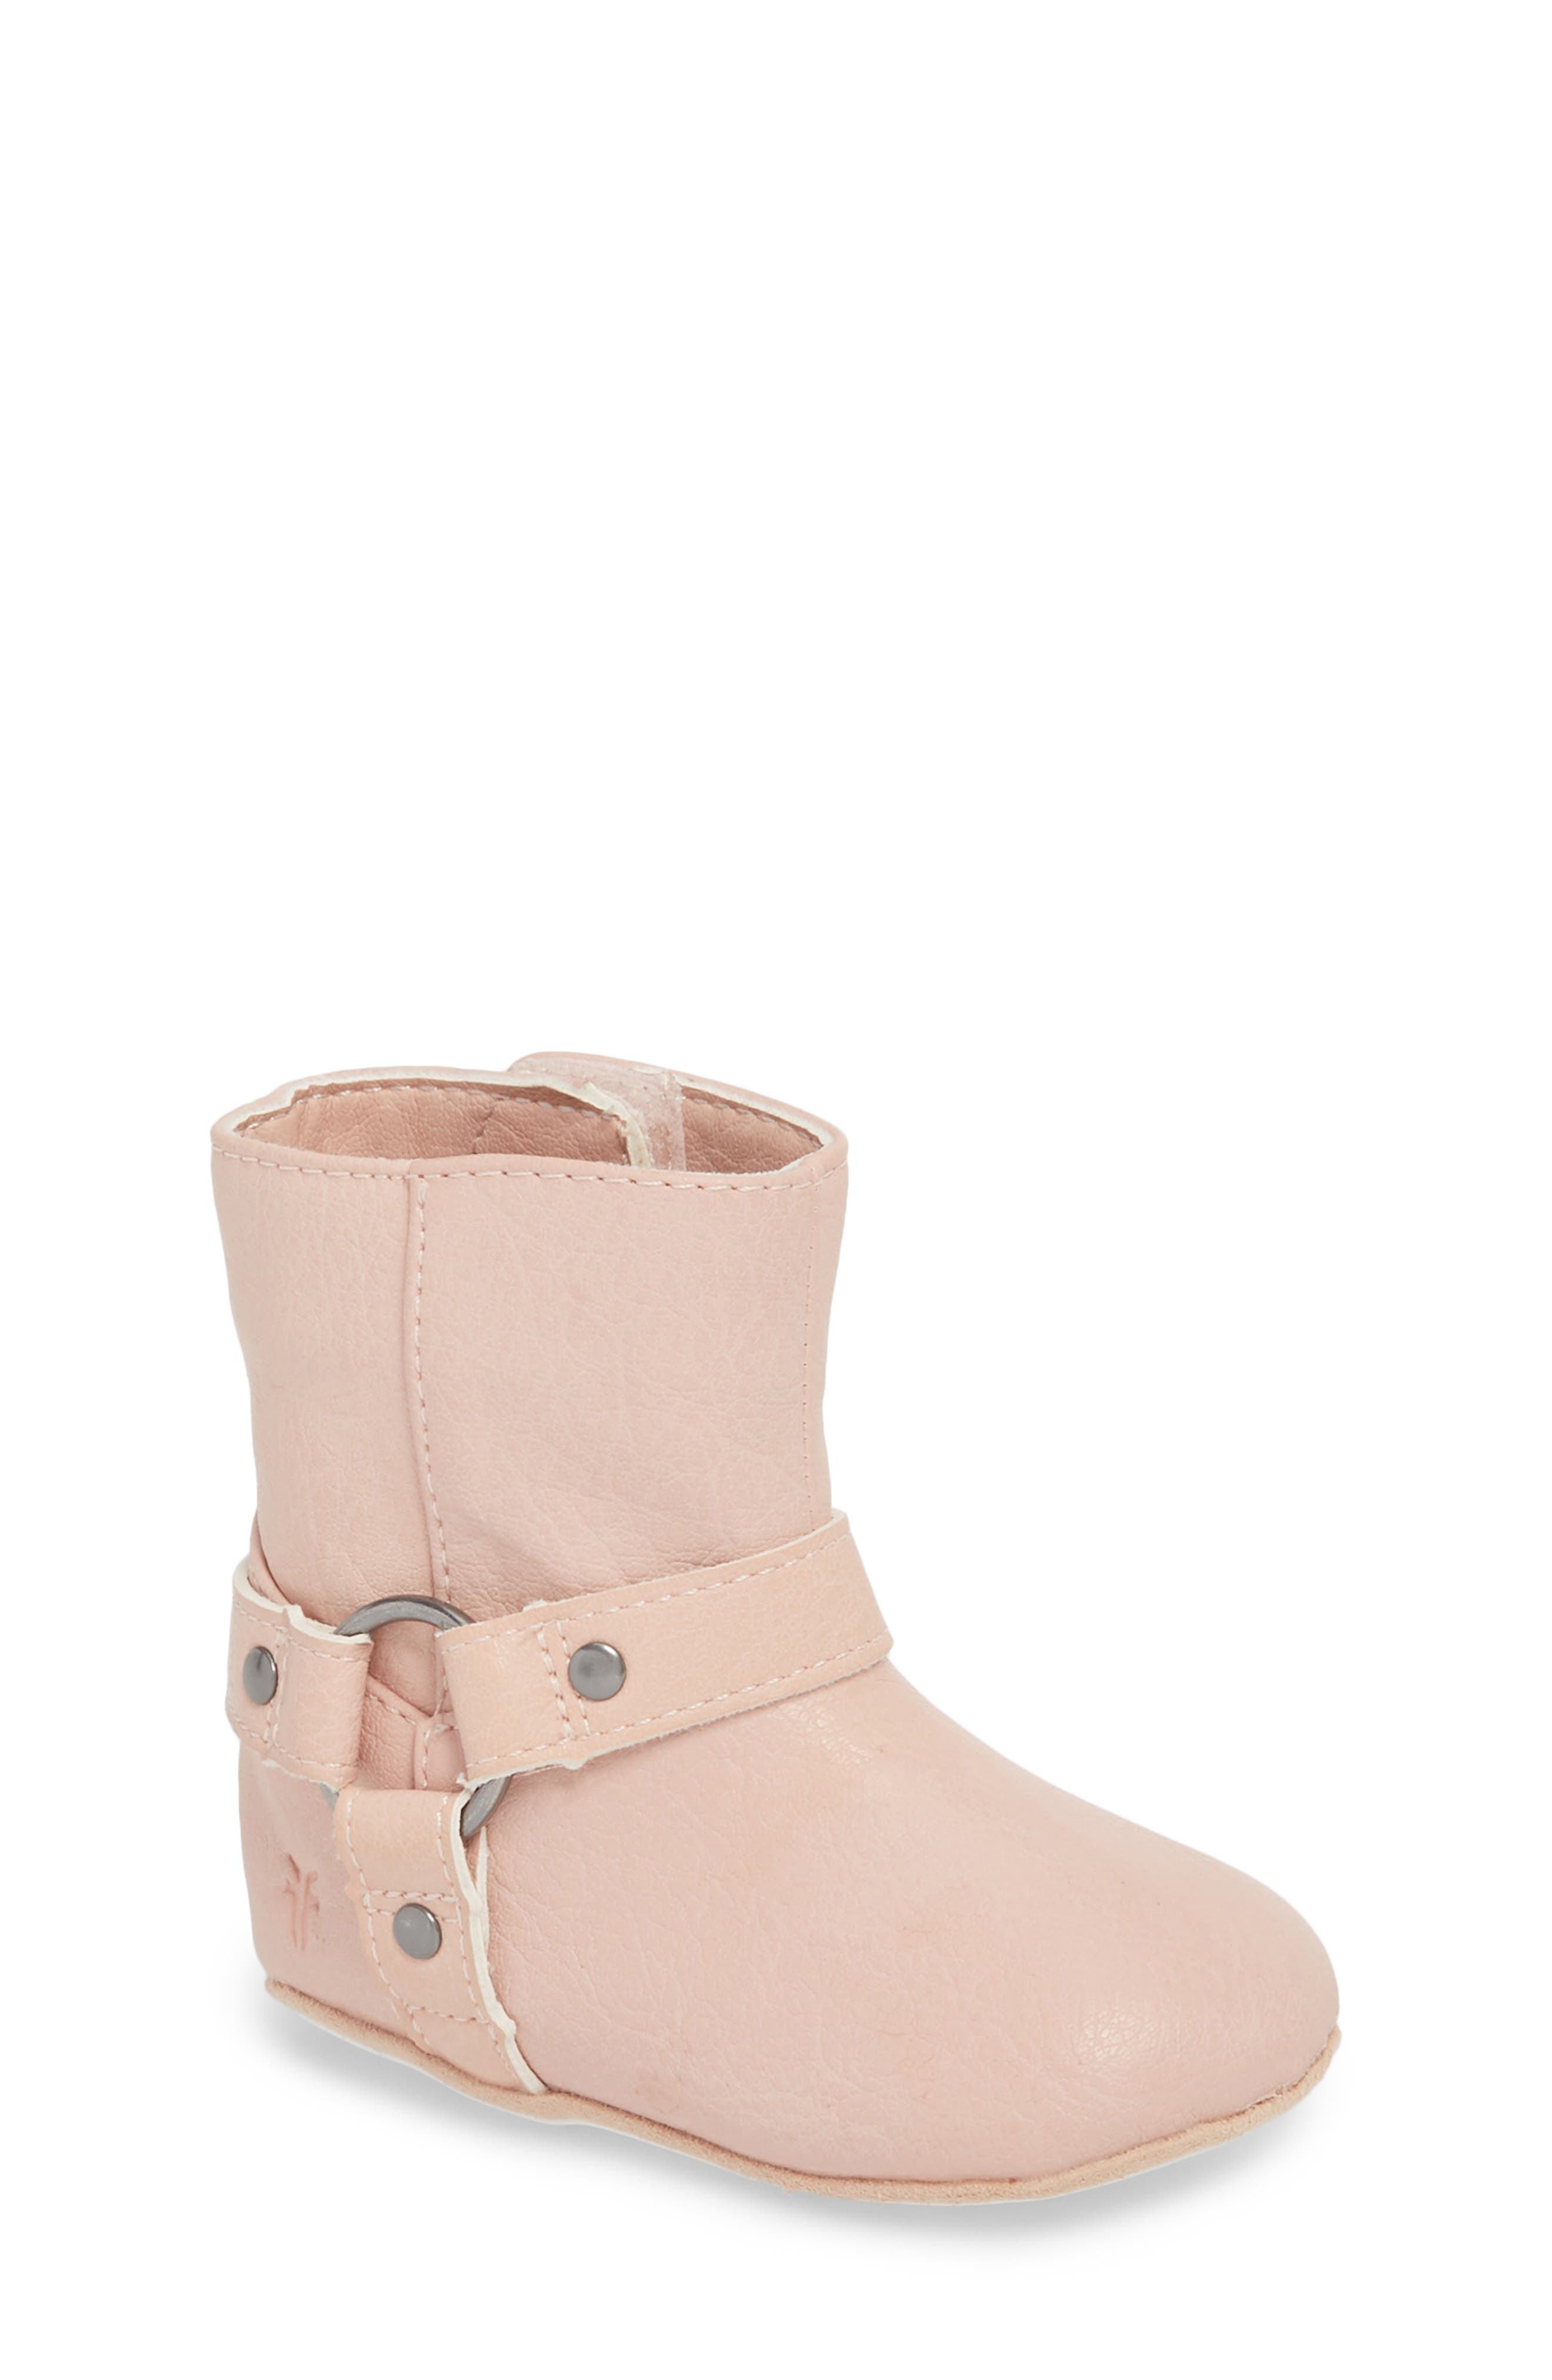 Frye Harness Boot Crib Shoe (Baby)